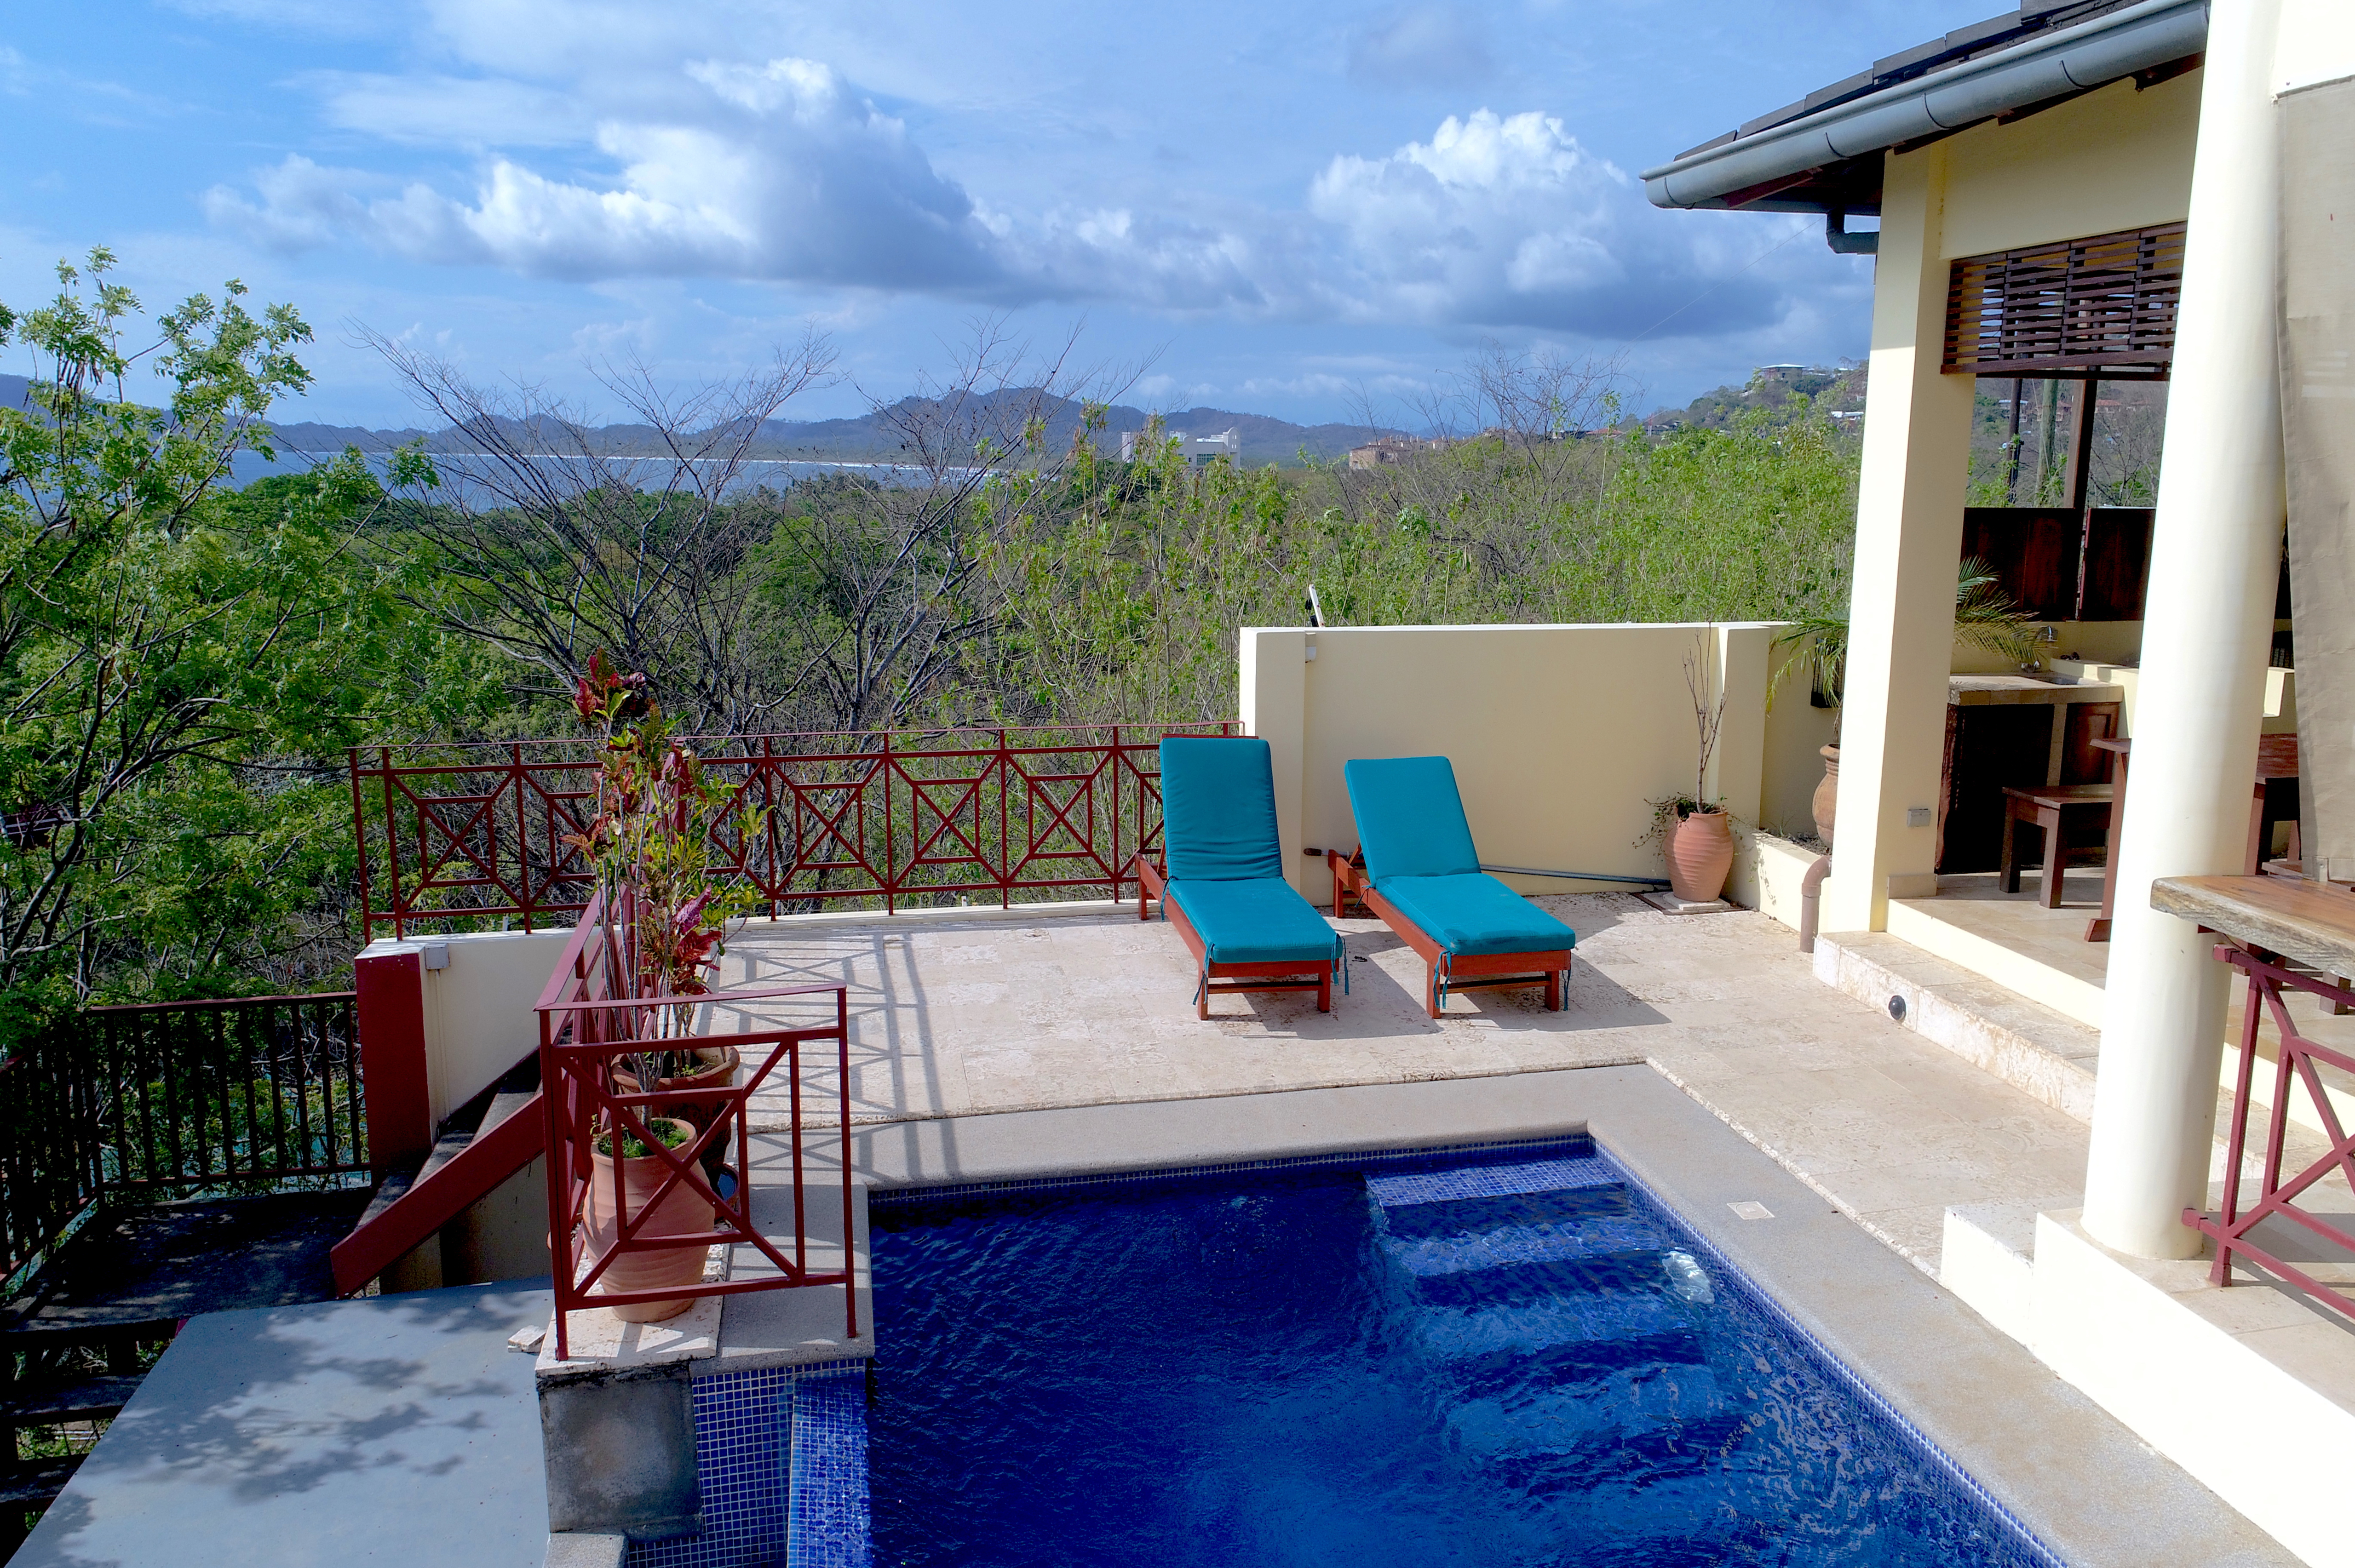 Casa Canopy, ocean view home, Playa Tamarindo, Costa Rica